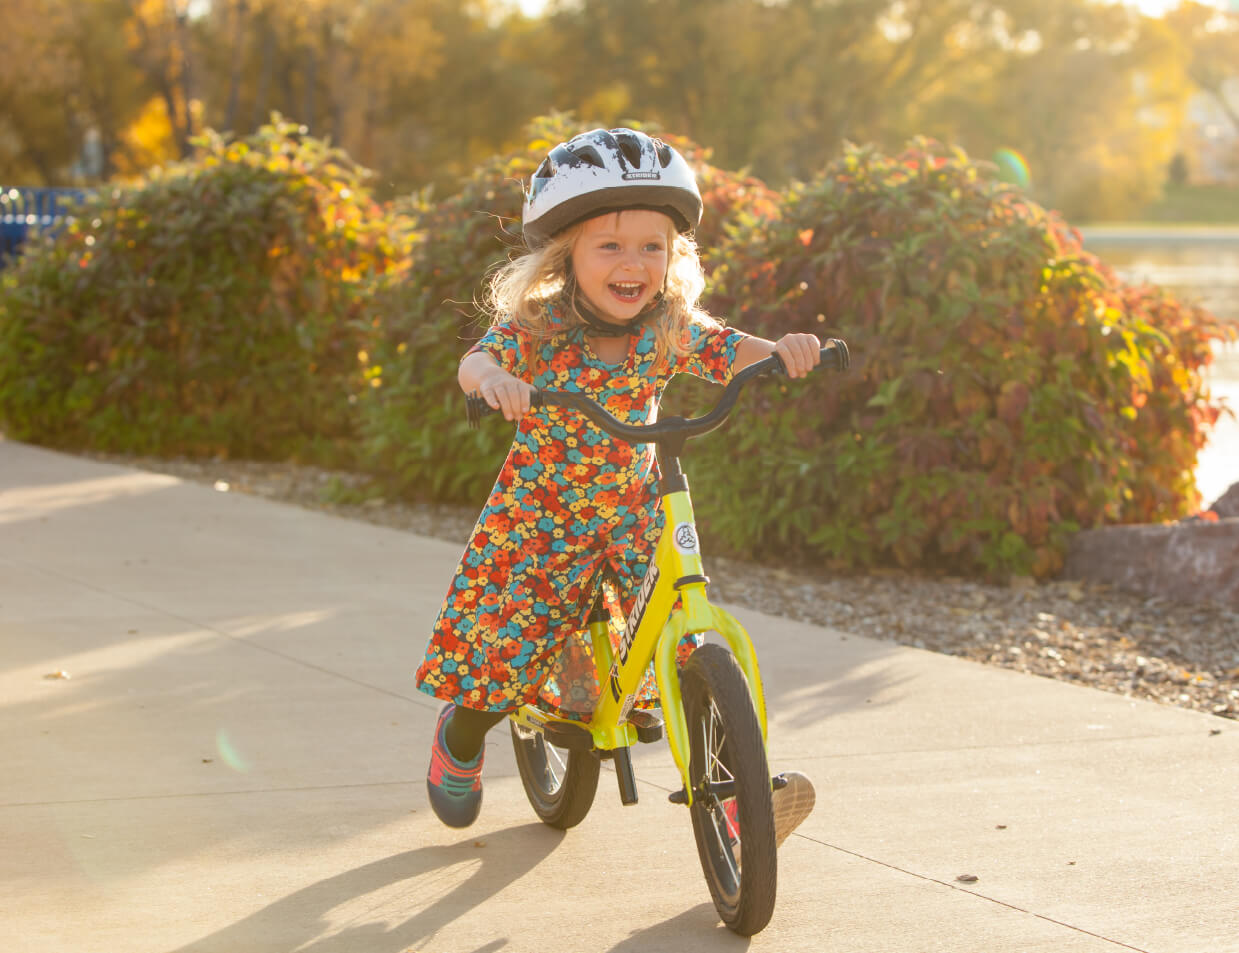 a girl learns to ride a bike